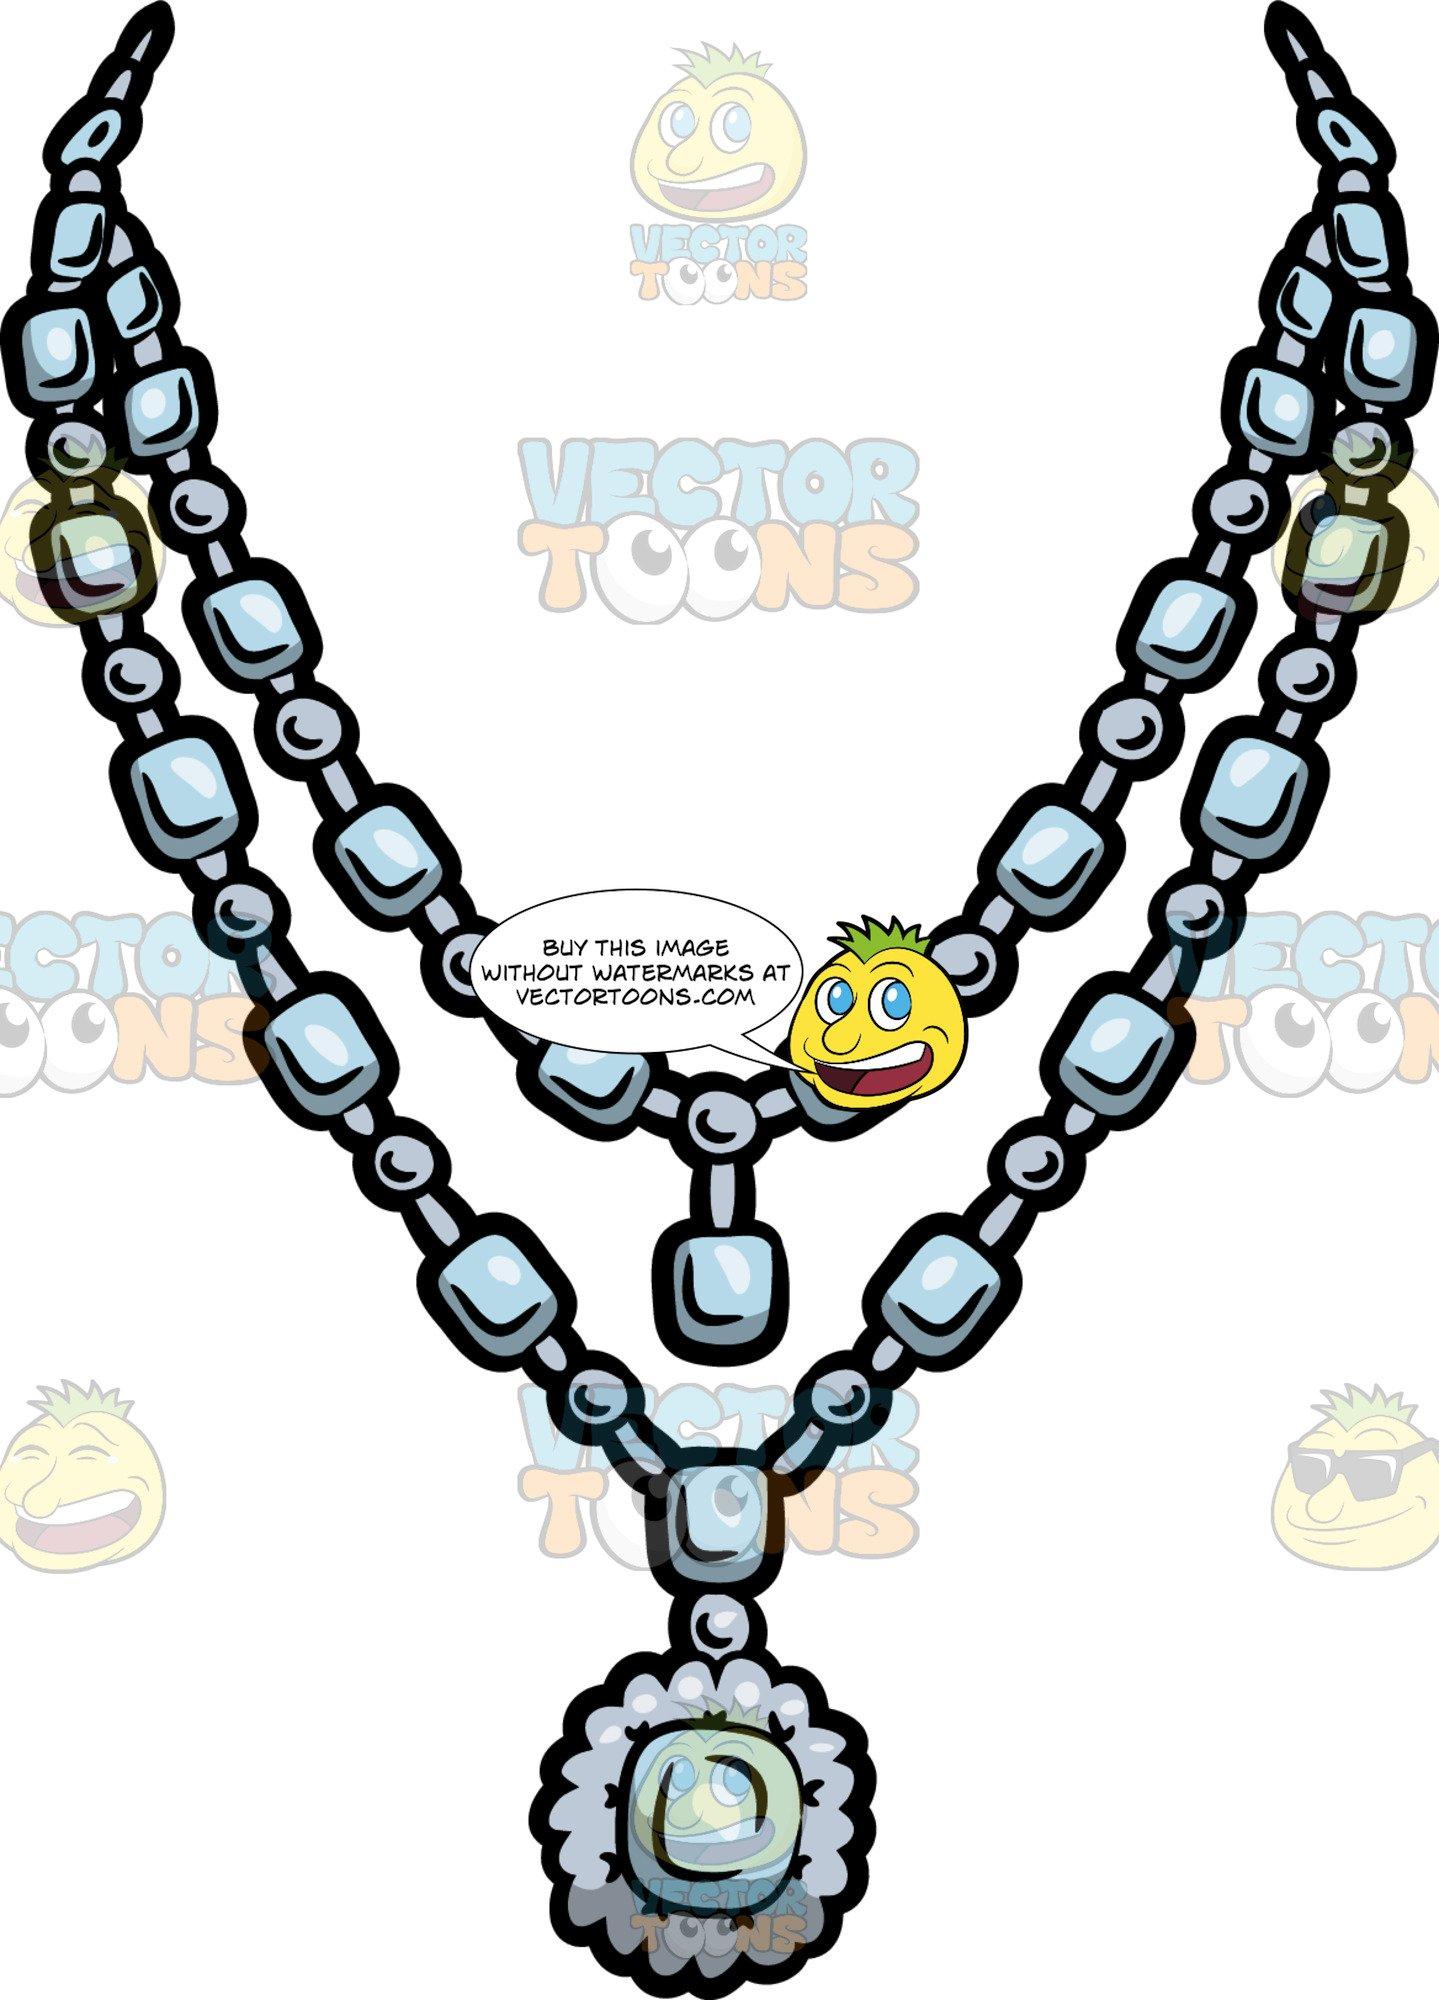 Diamonds clipart jewelry. An expensive diamond necklace